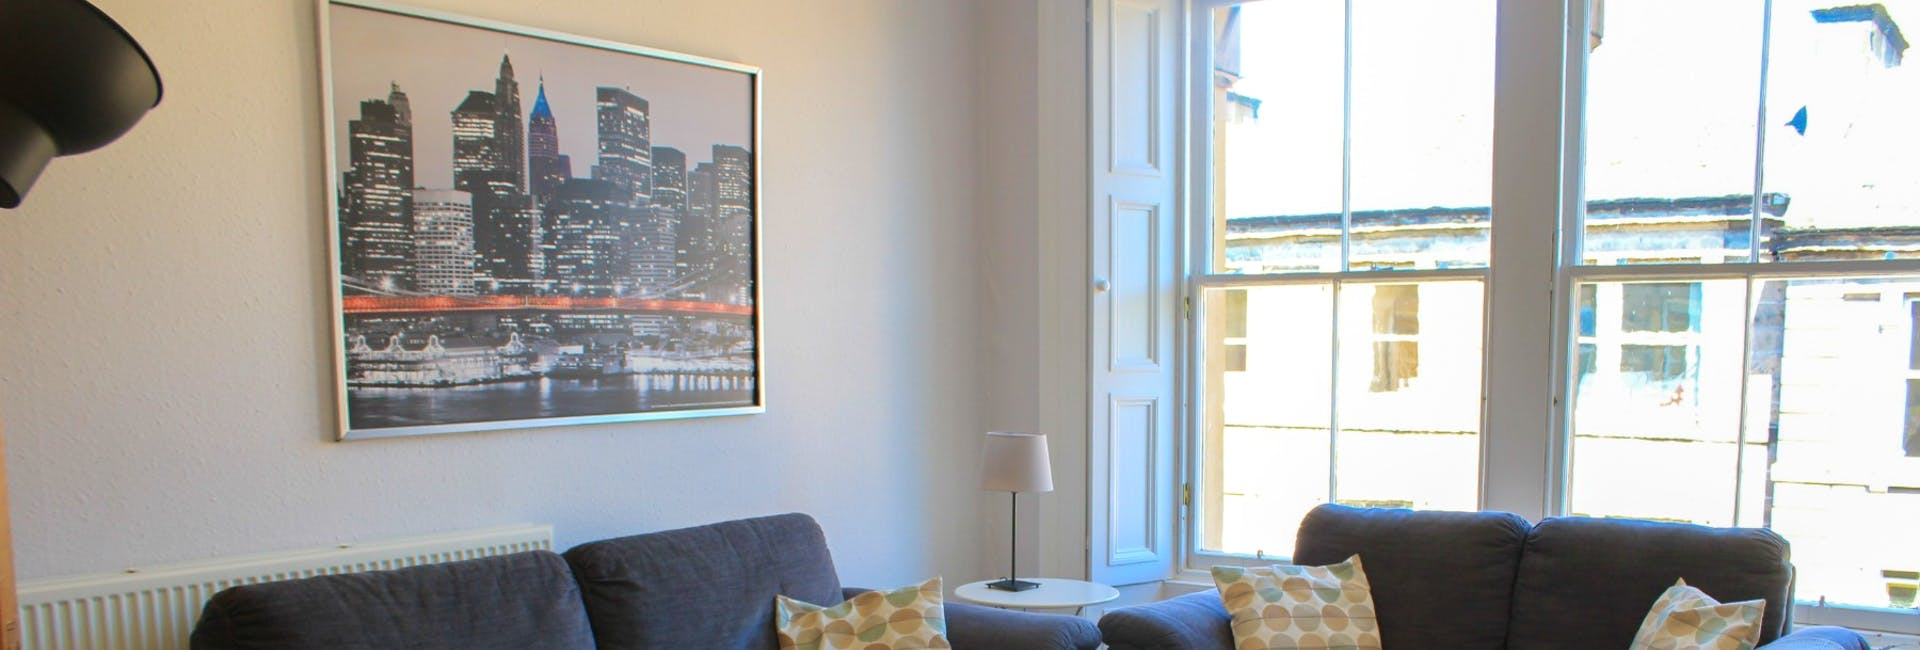 Featured Image for Valleyfield Street P374 Lauriston and Bruntsfield Edinburgh